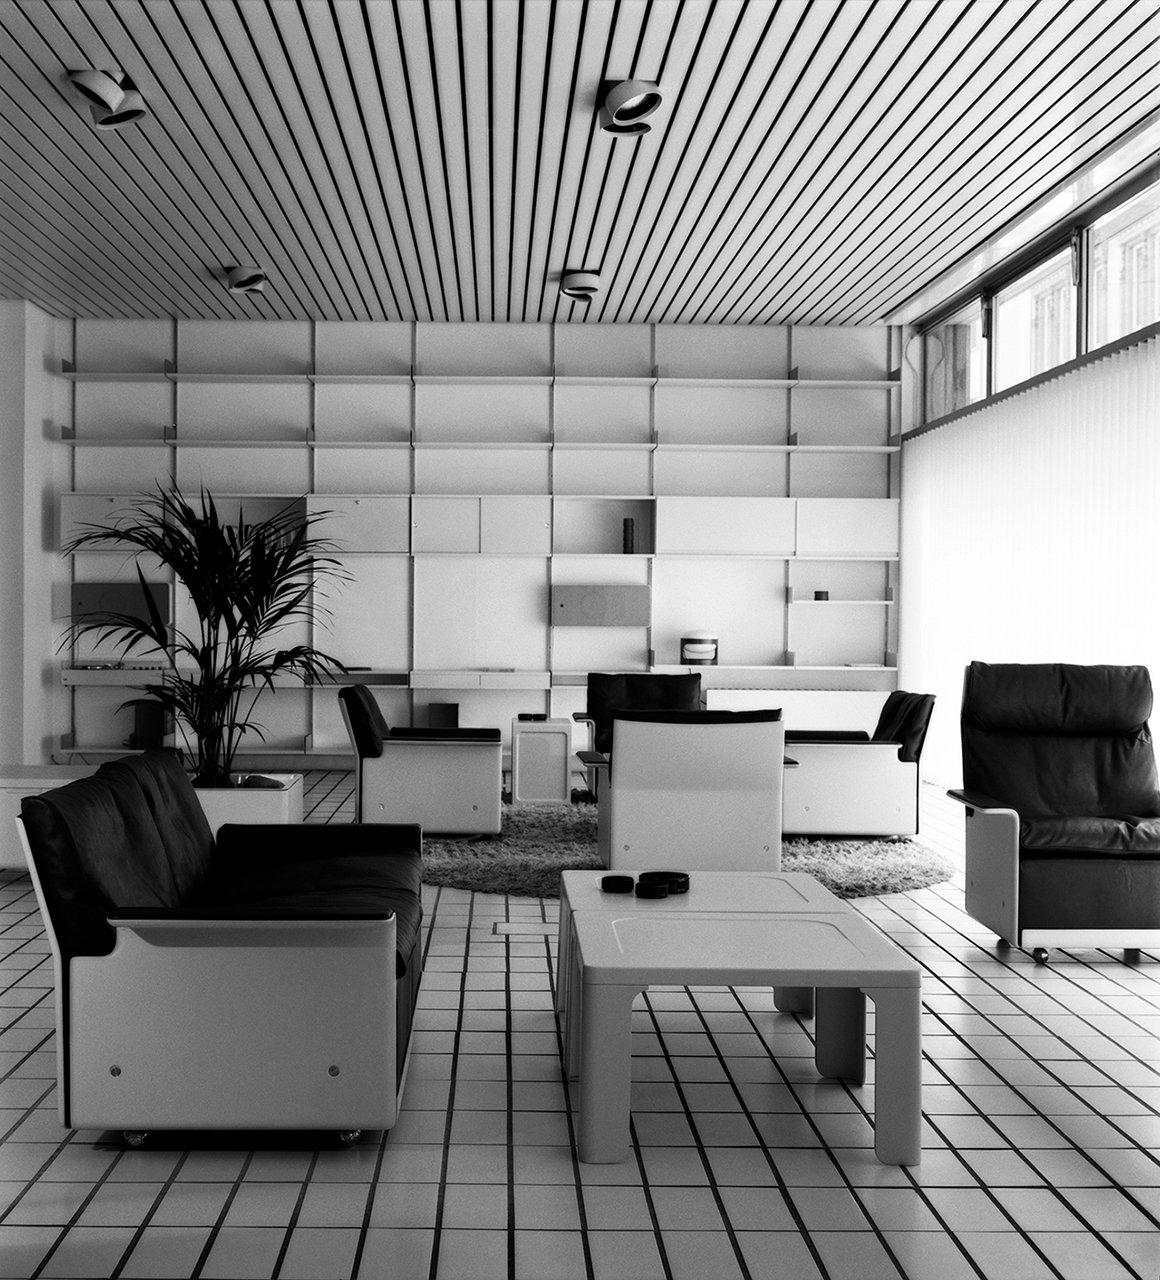 Dieter Rams in mostra al Vitra Design Museum